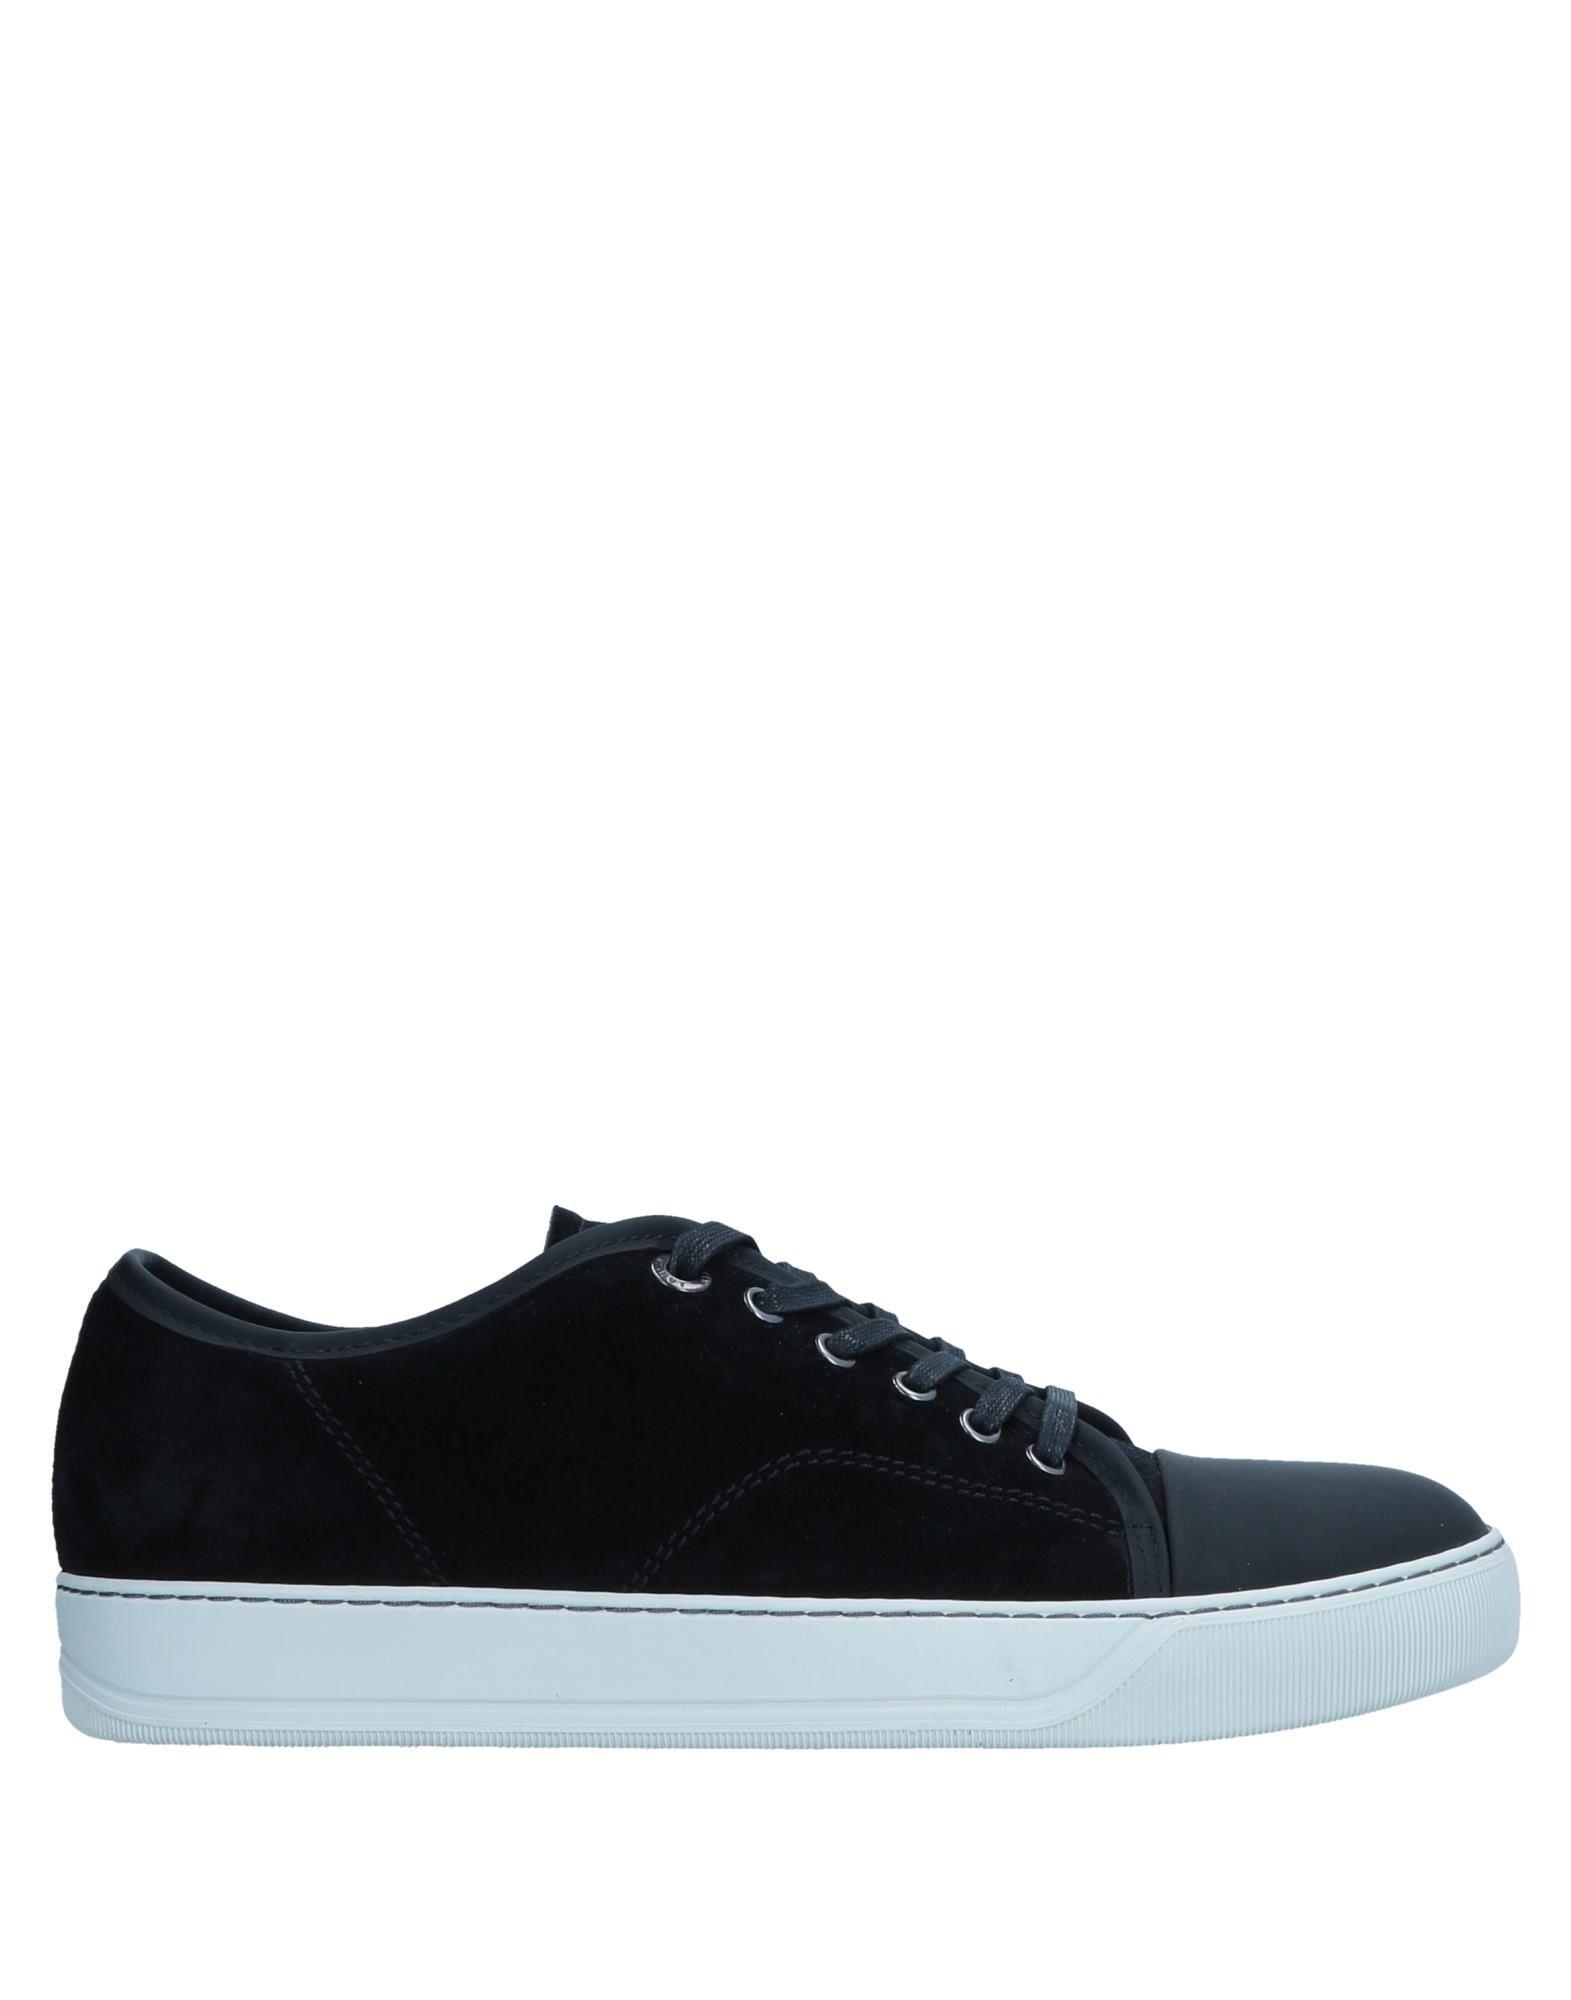 Lanvin Sneakers Herren  11467357ST Gute Qualität beliebte Schuhe